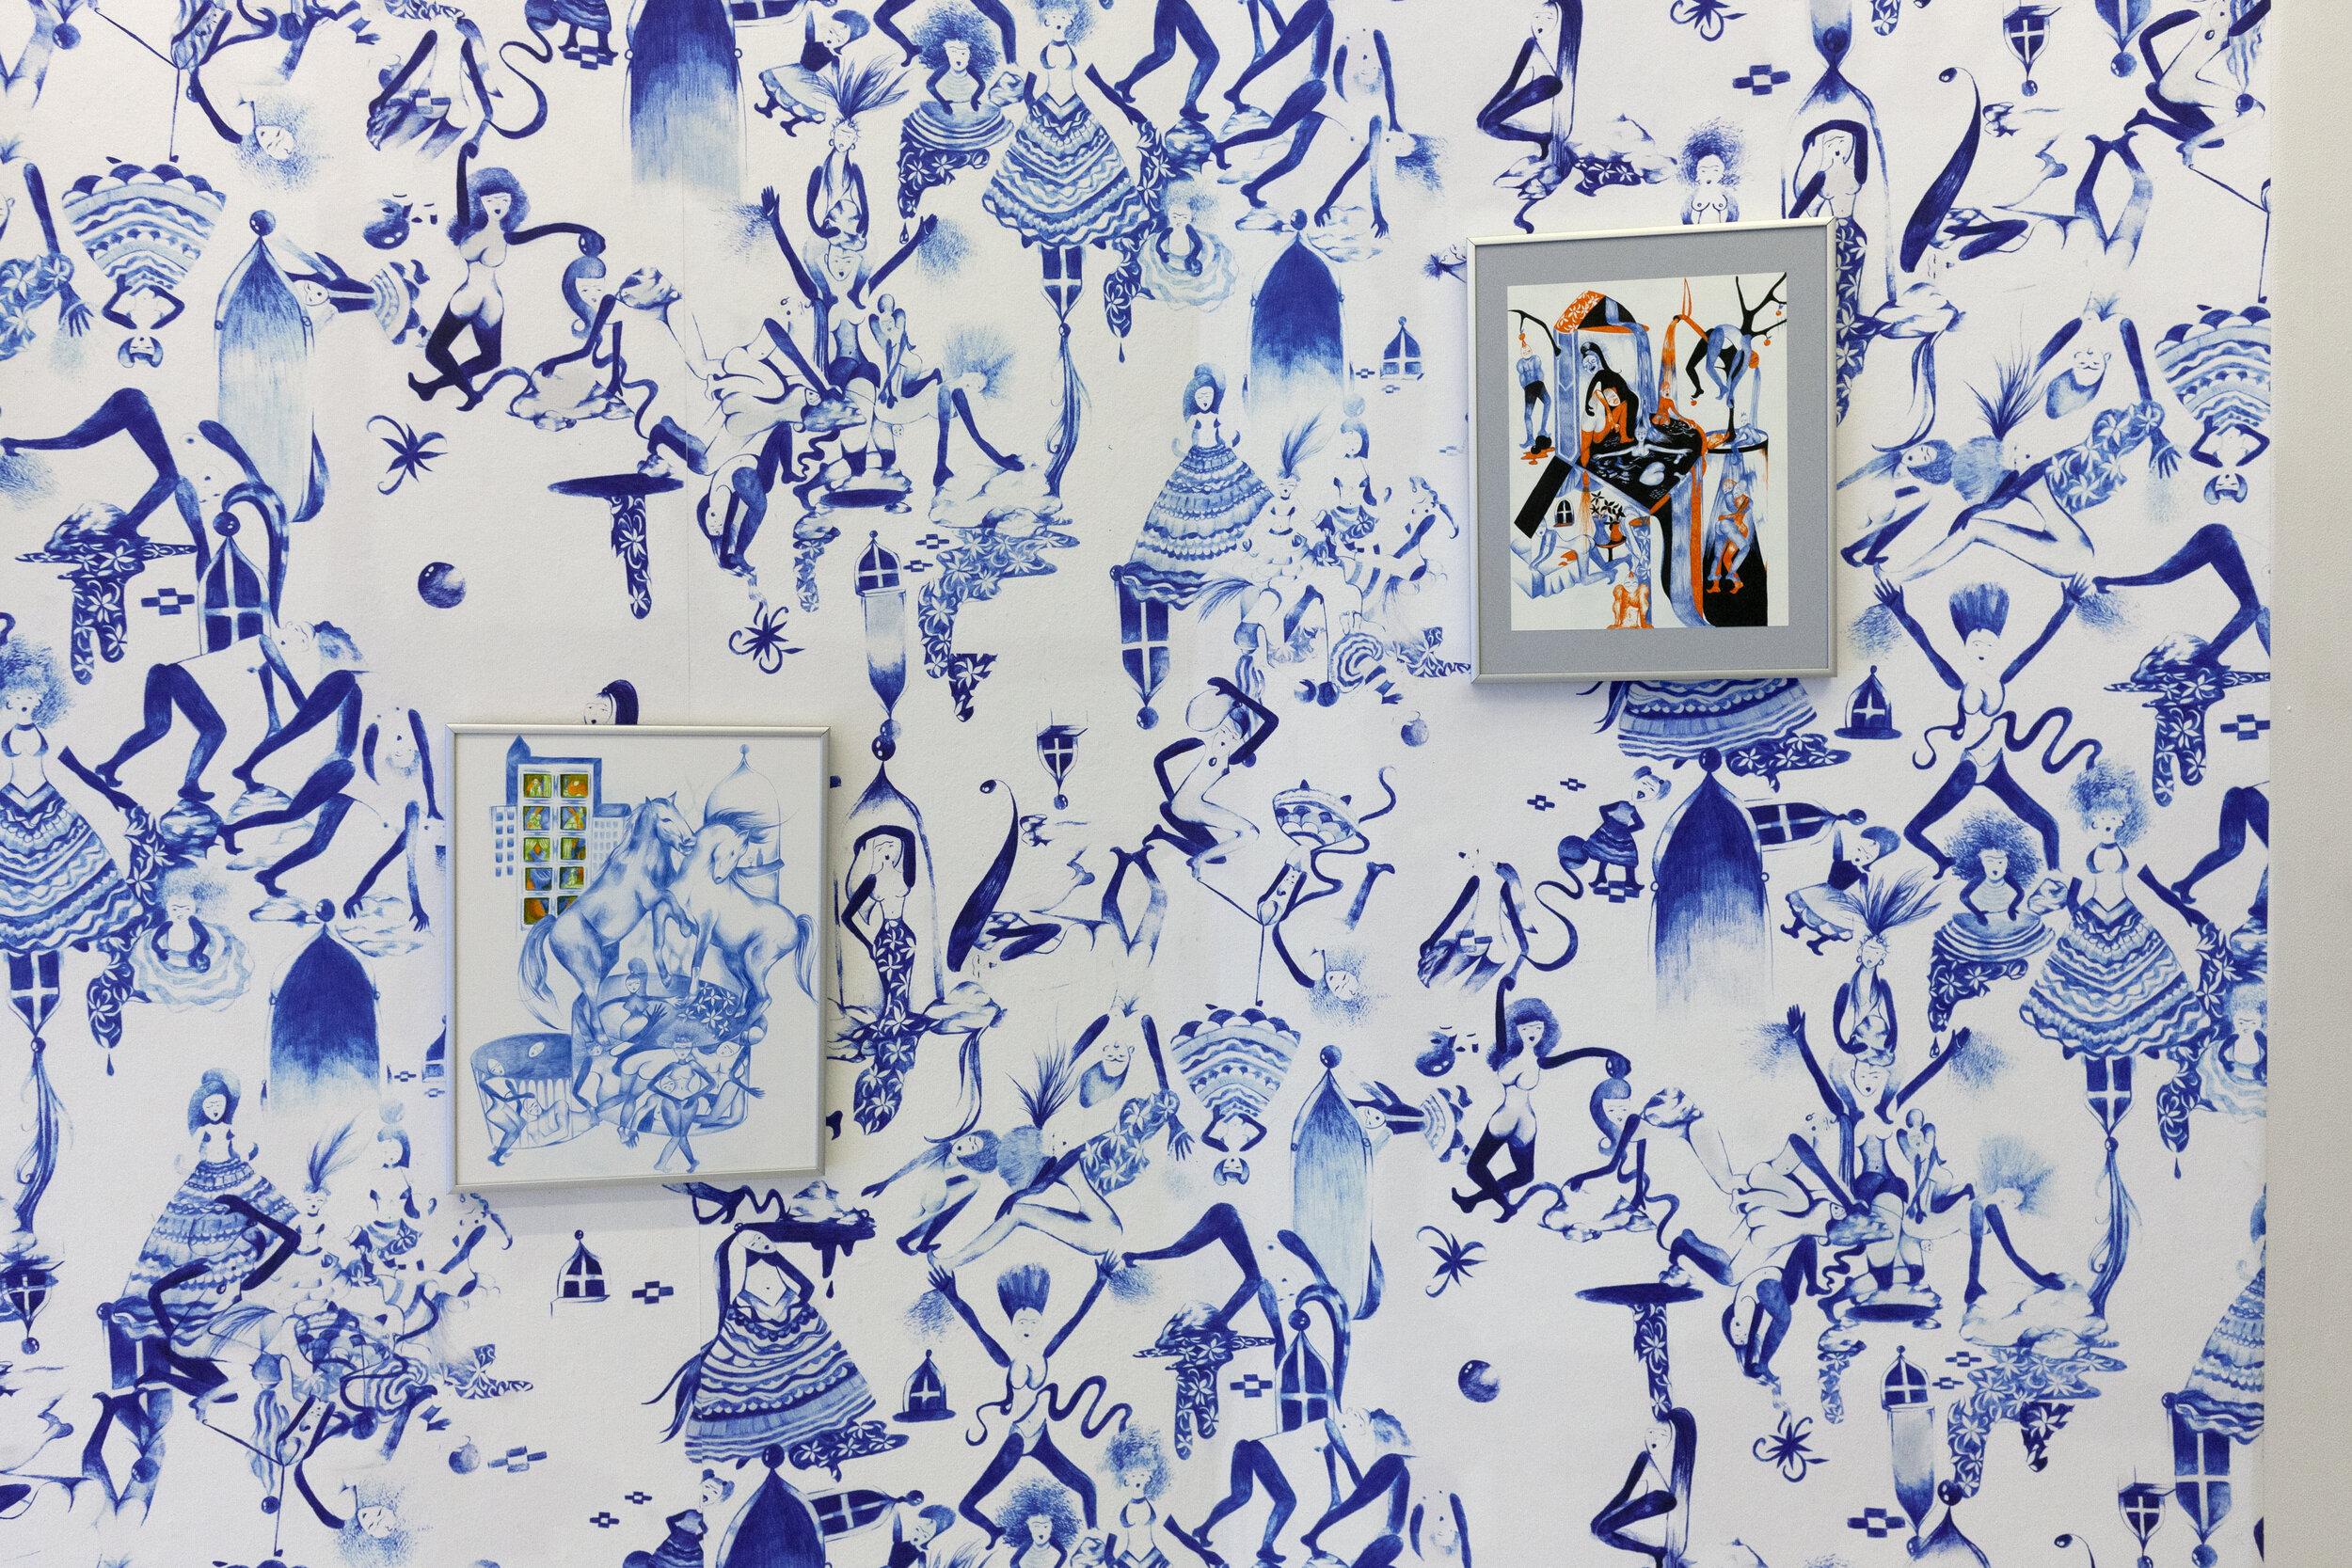 Poupette Confined, 2019. Wallpaper, 100 x 150 inches. Edition of 5